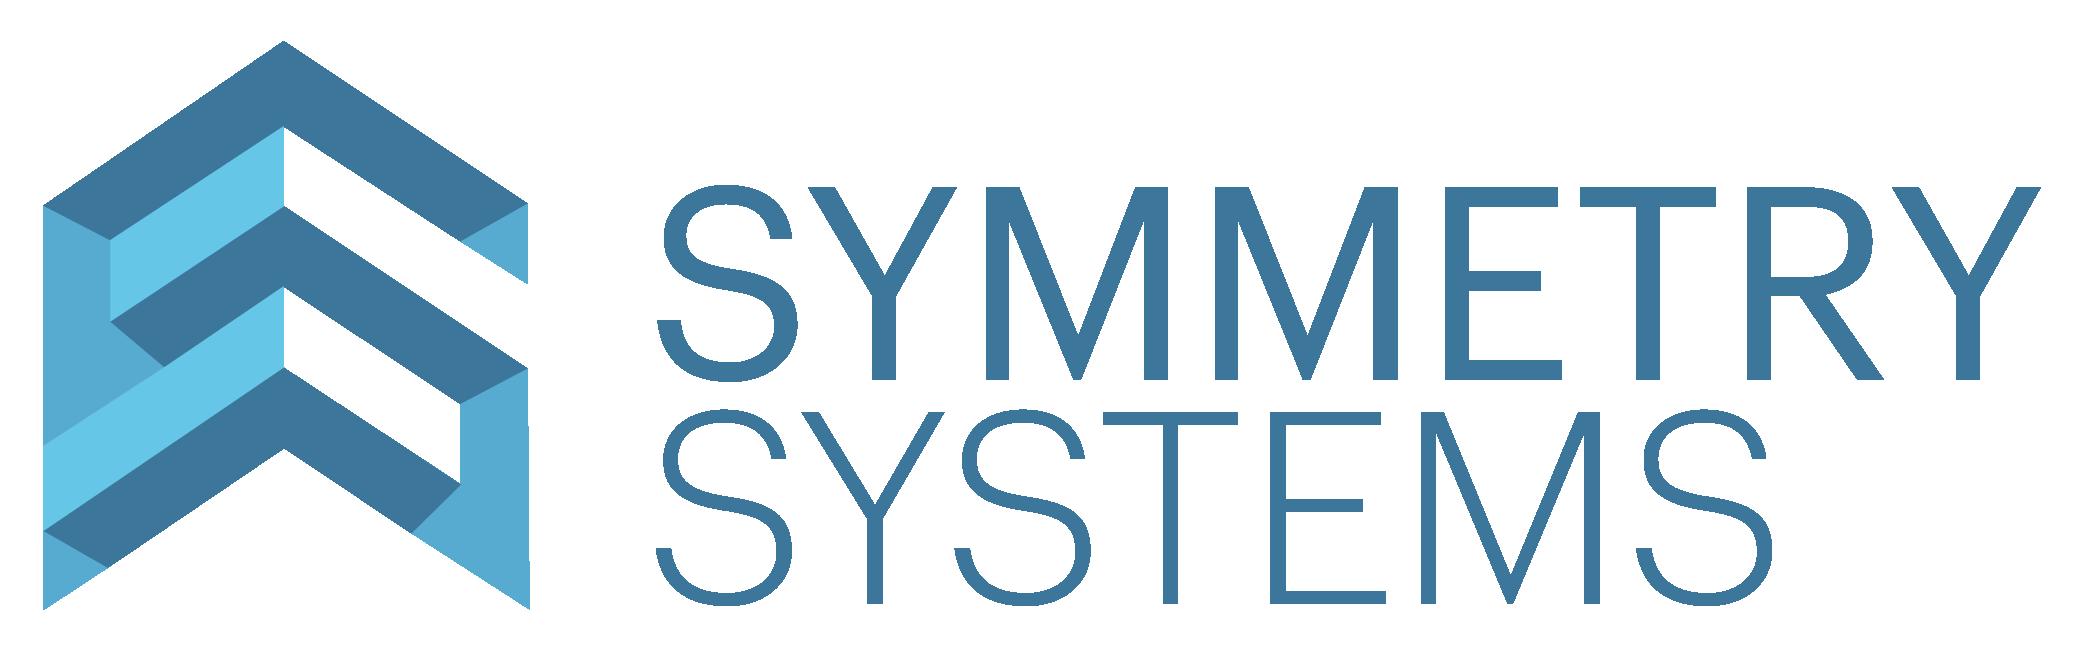 Symmetry Systems logo